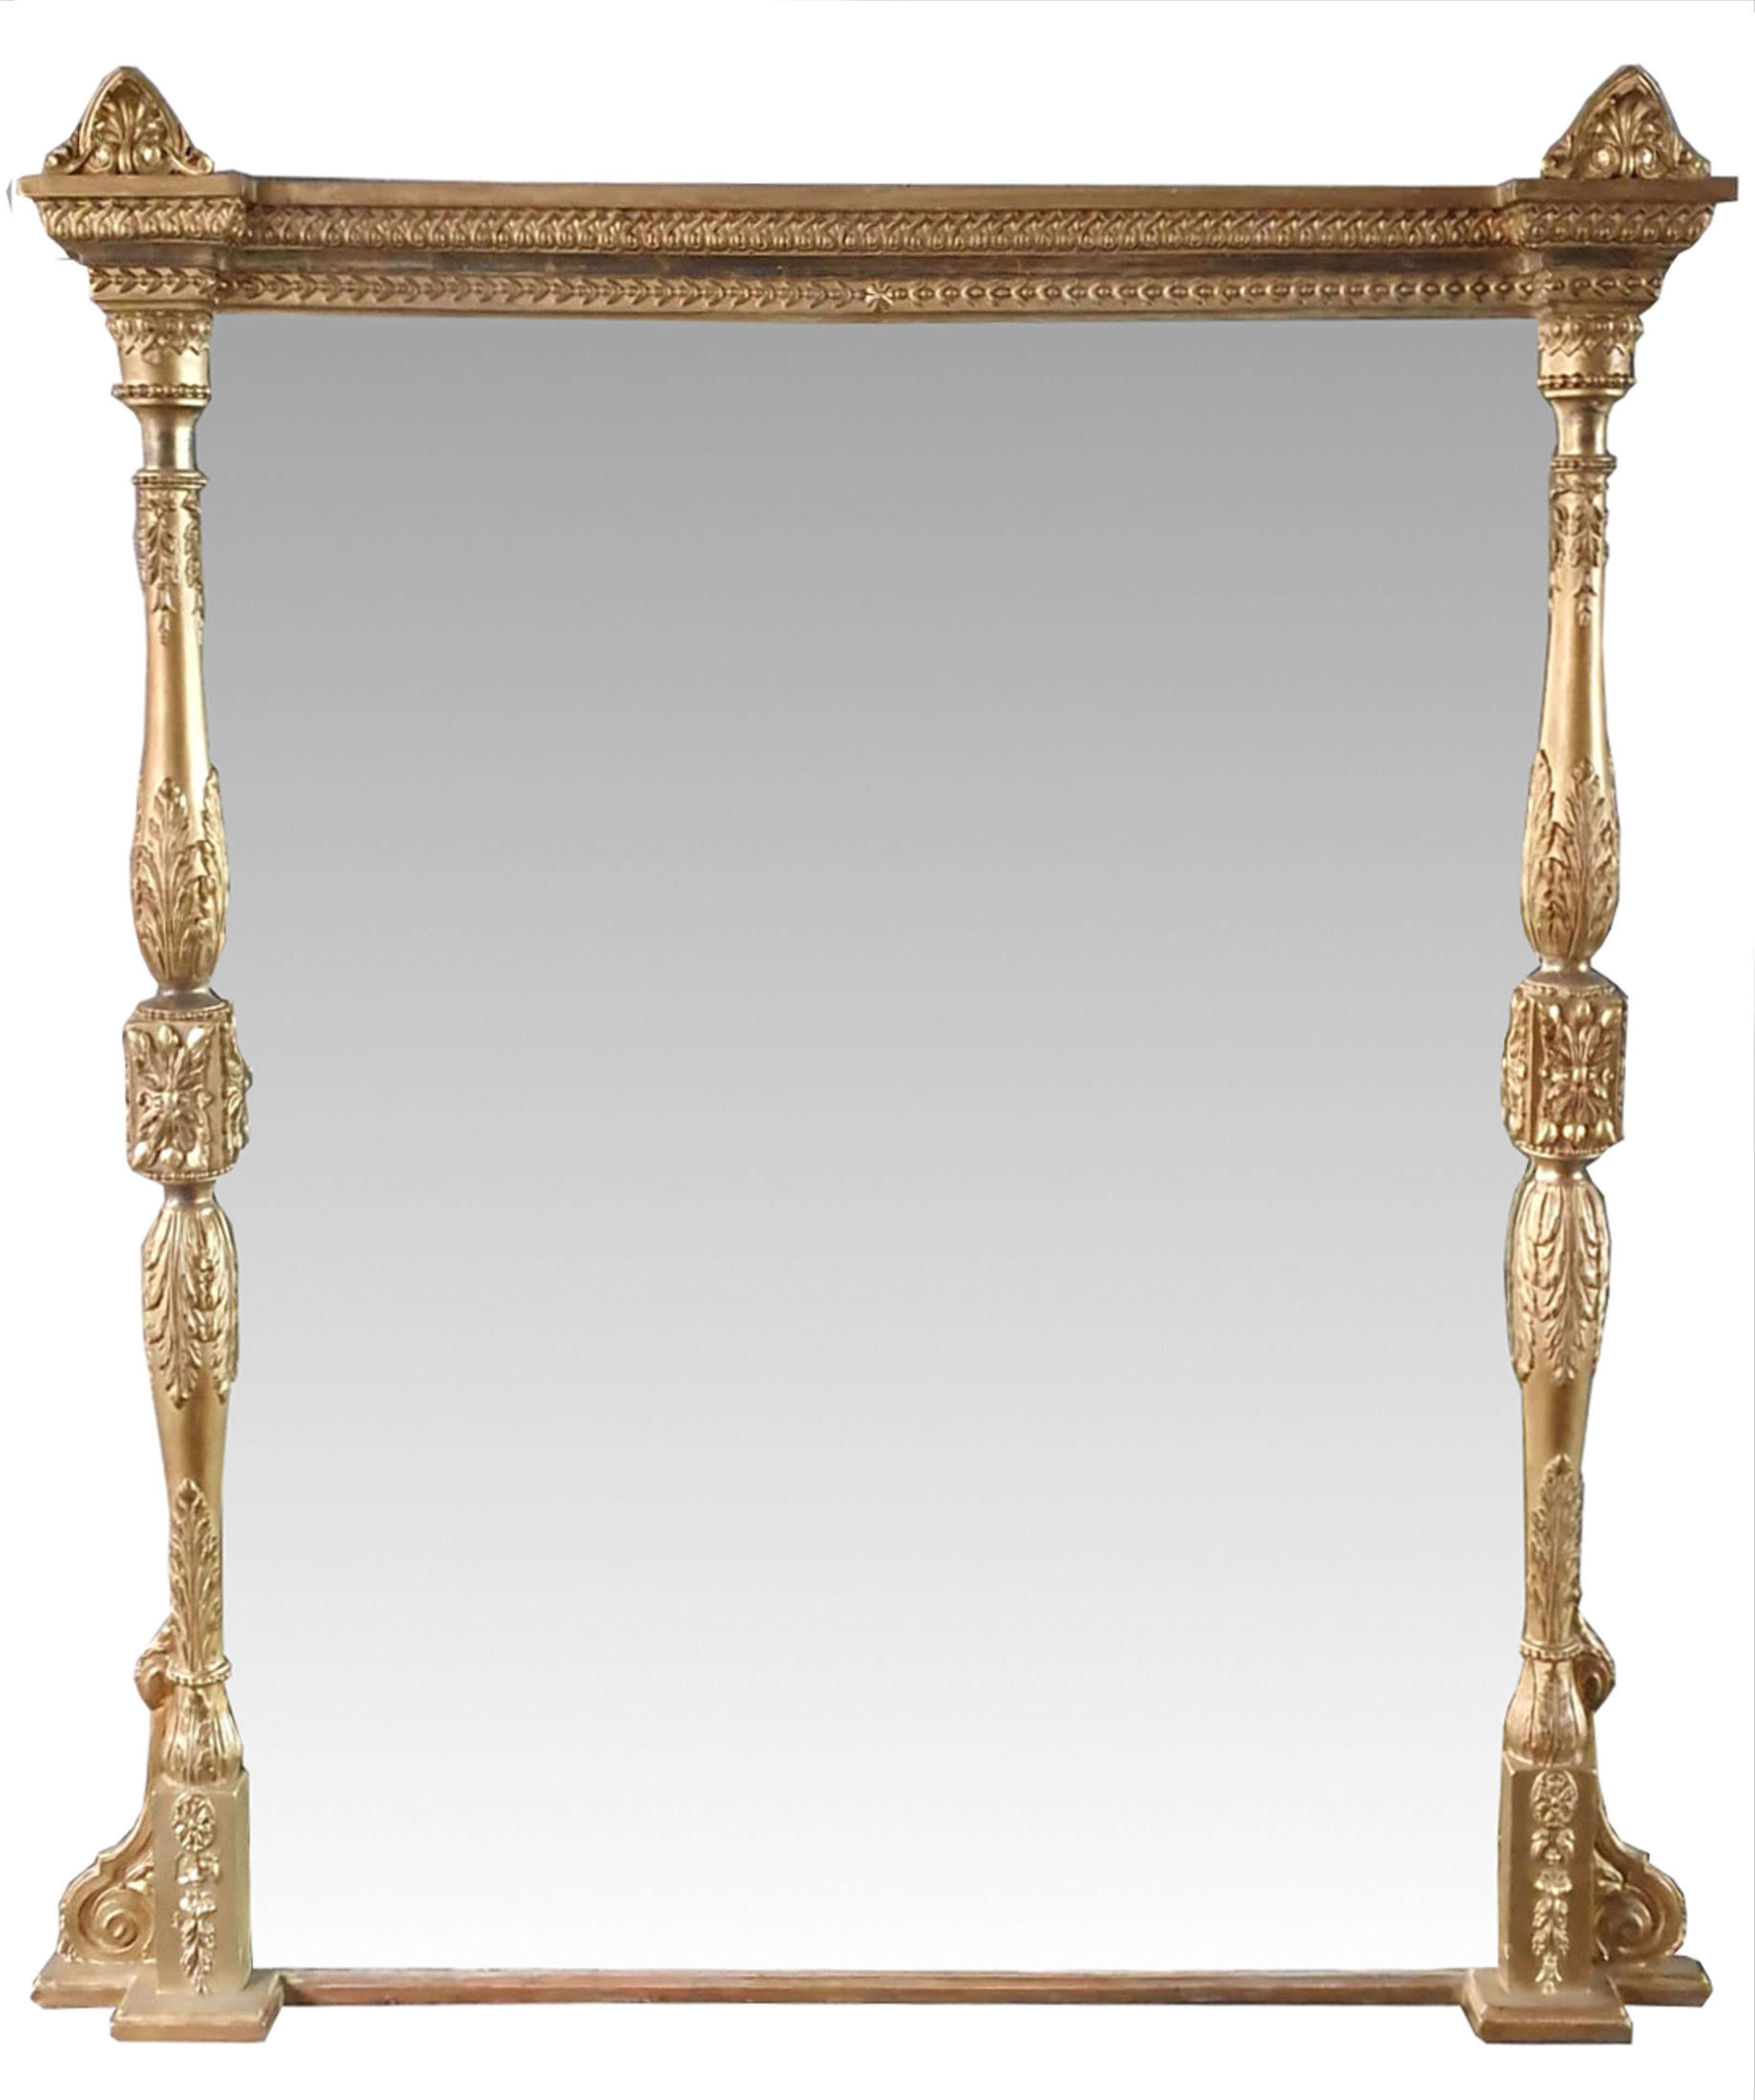 19th Century Rectangular Shaped Overmantle Mirror